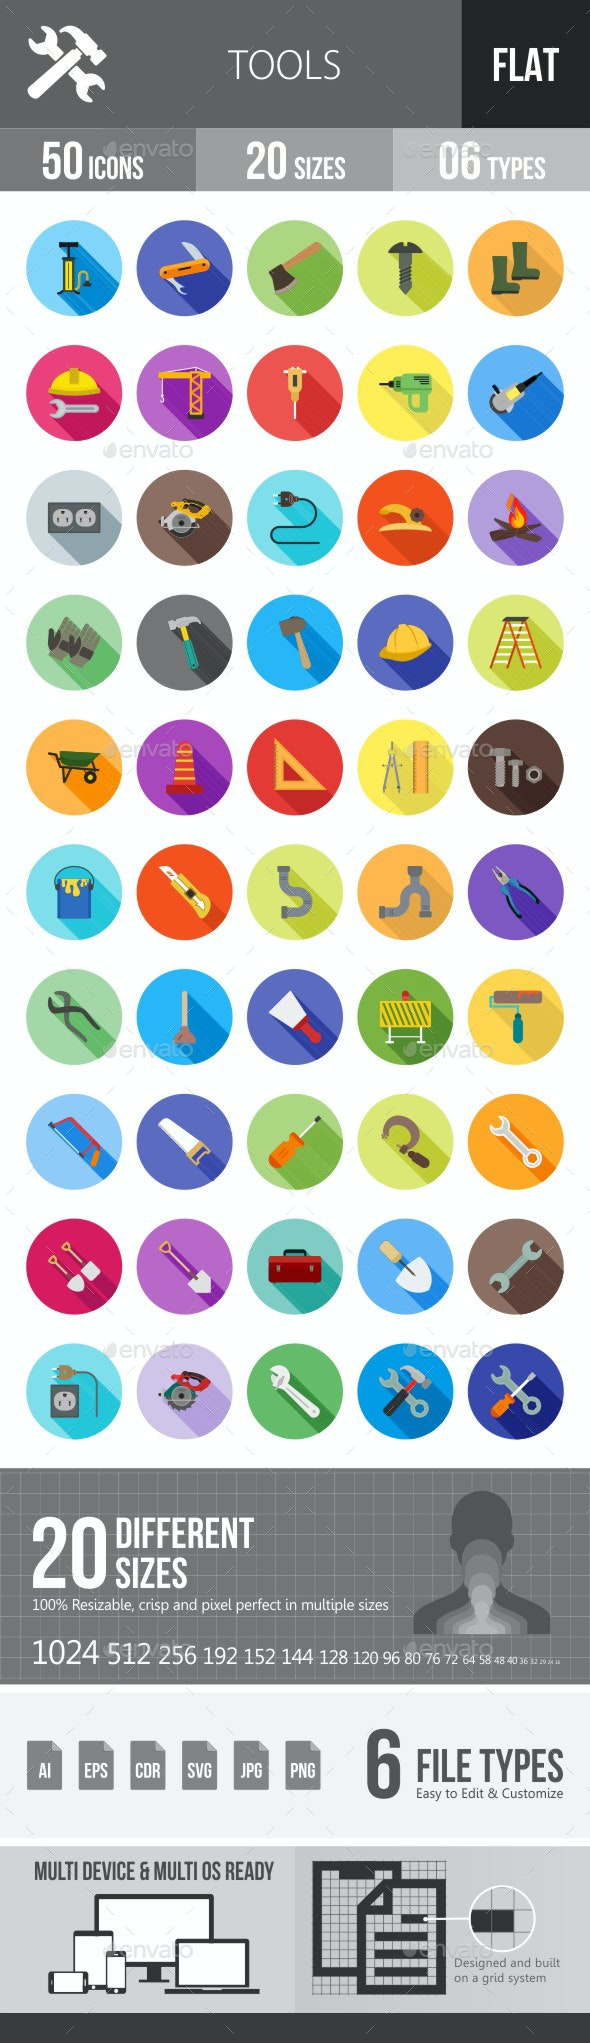 Tools Flat Shadowed Icons - Icons